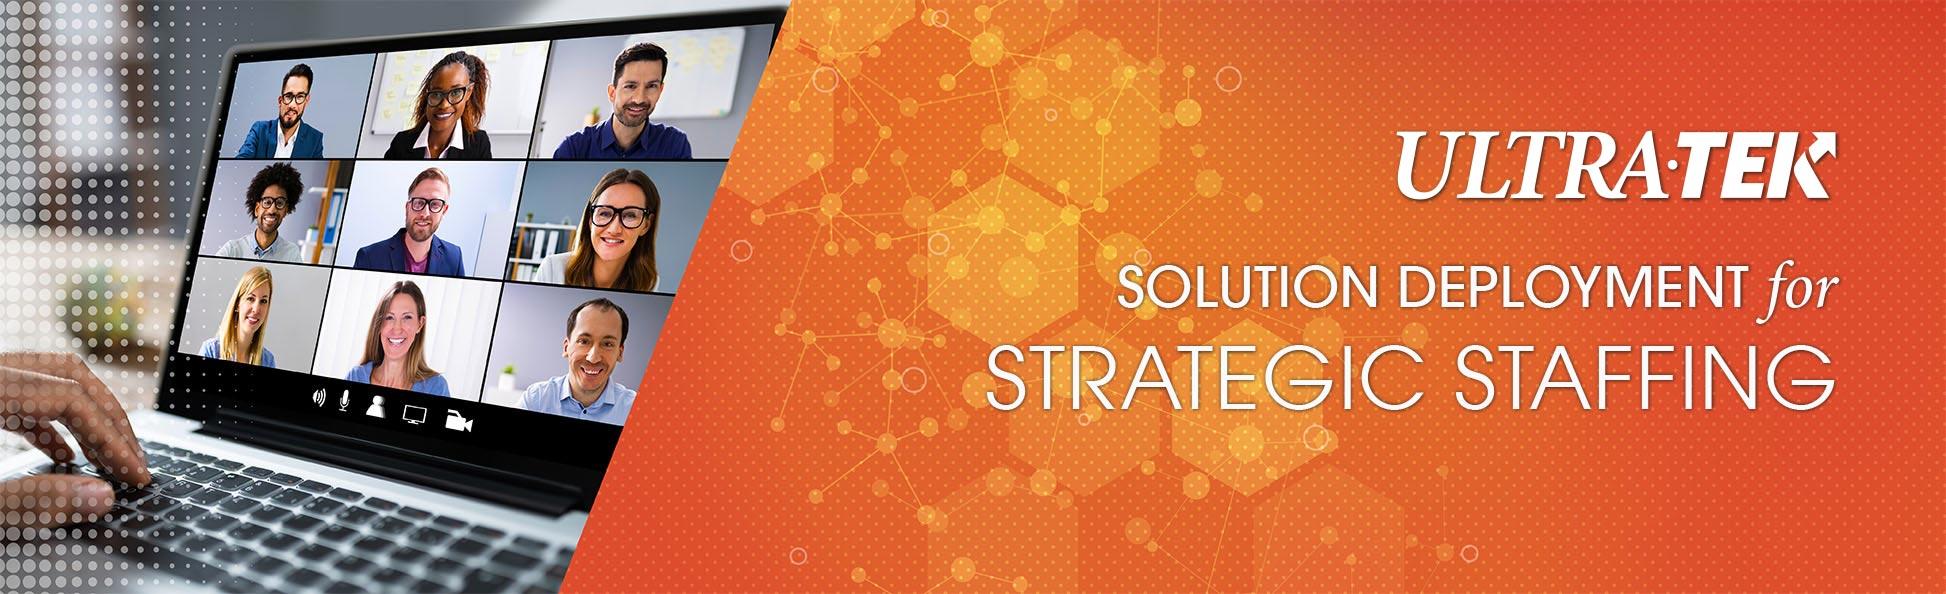 Solution Deployment for Strategic Staffing